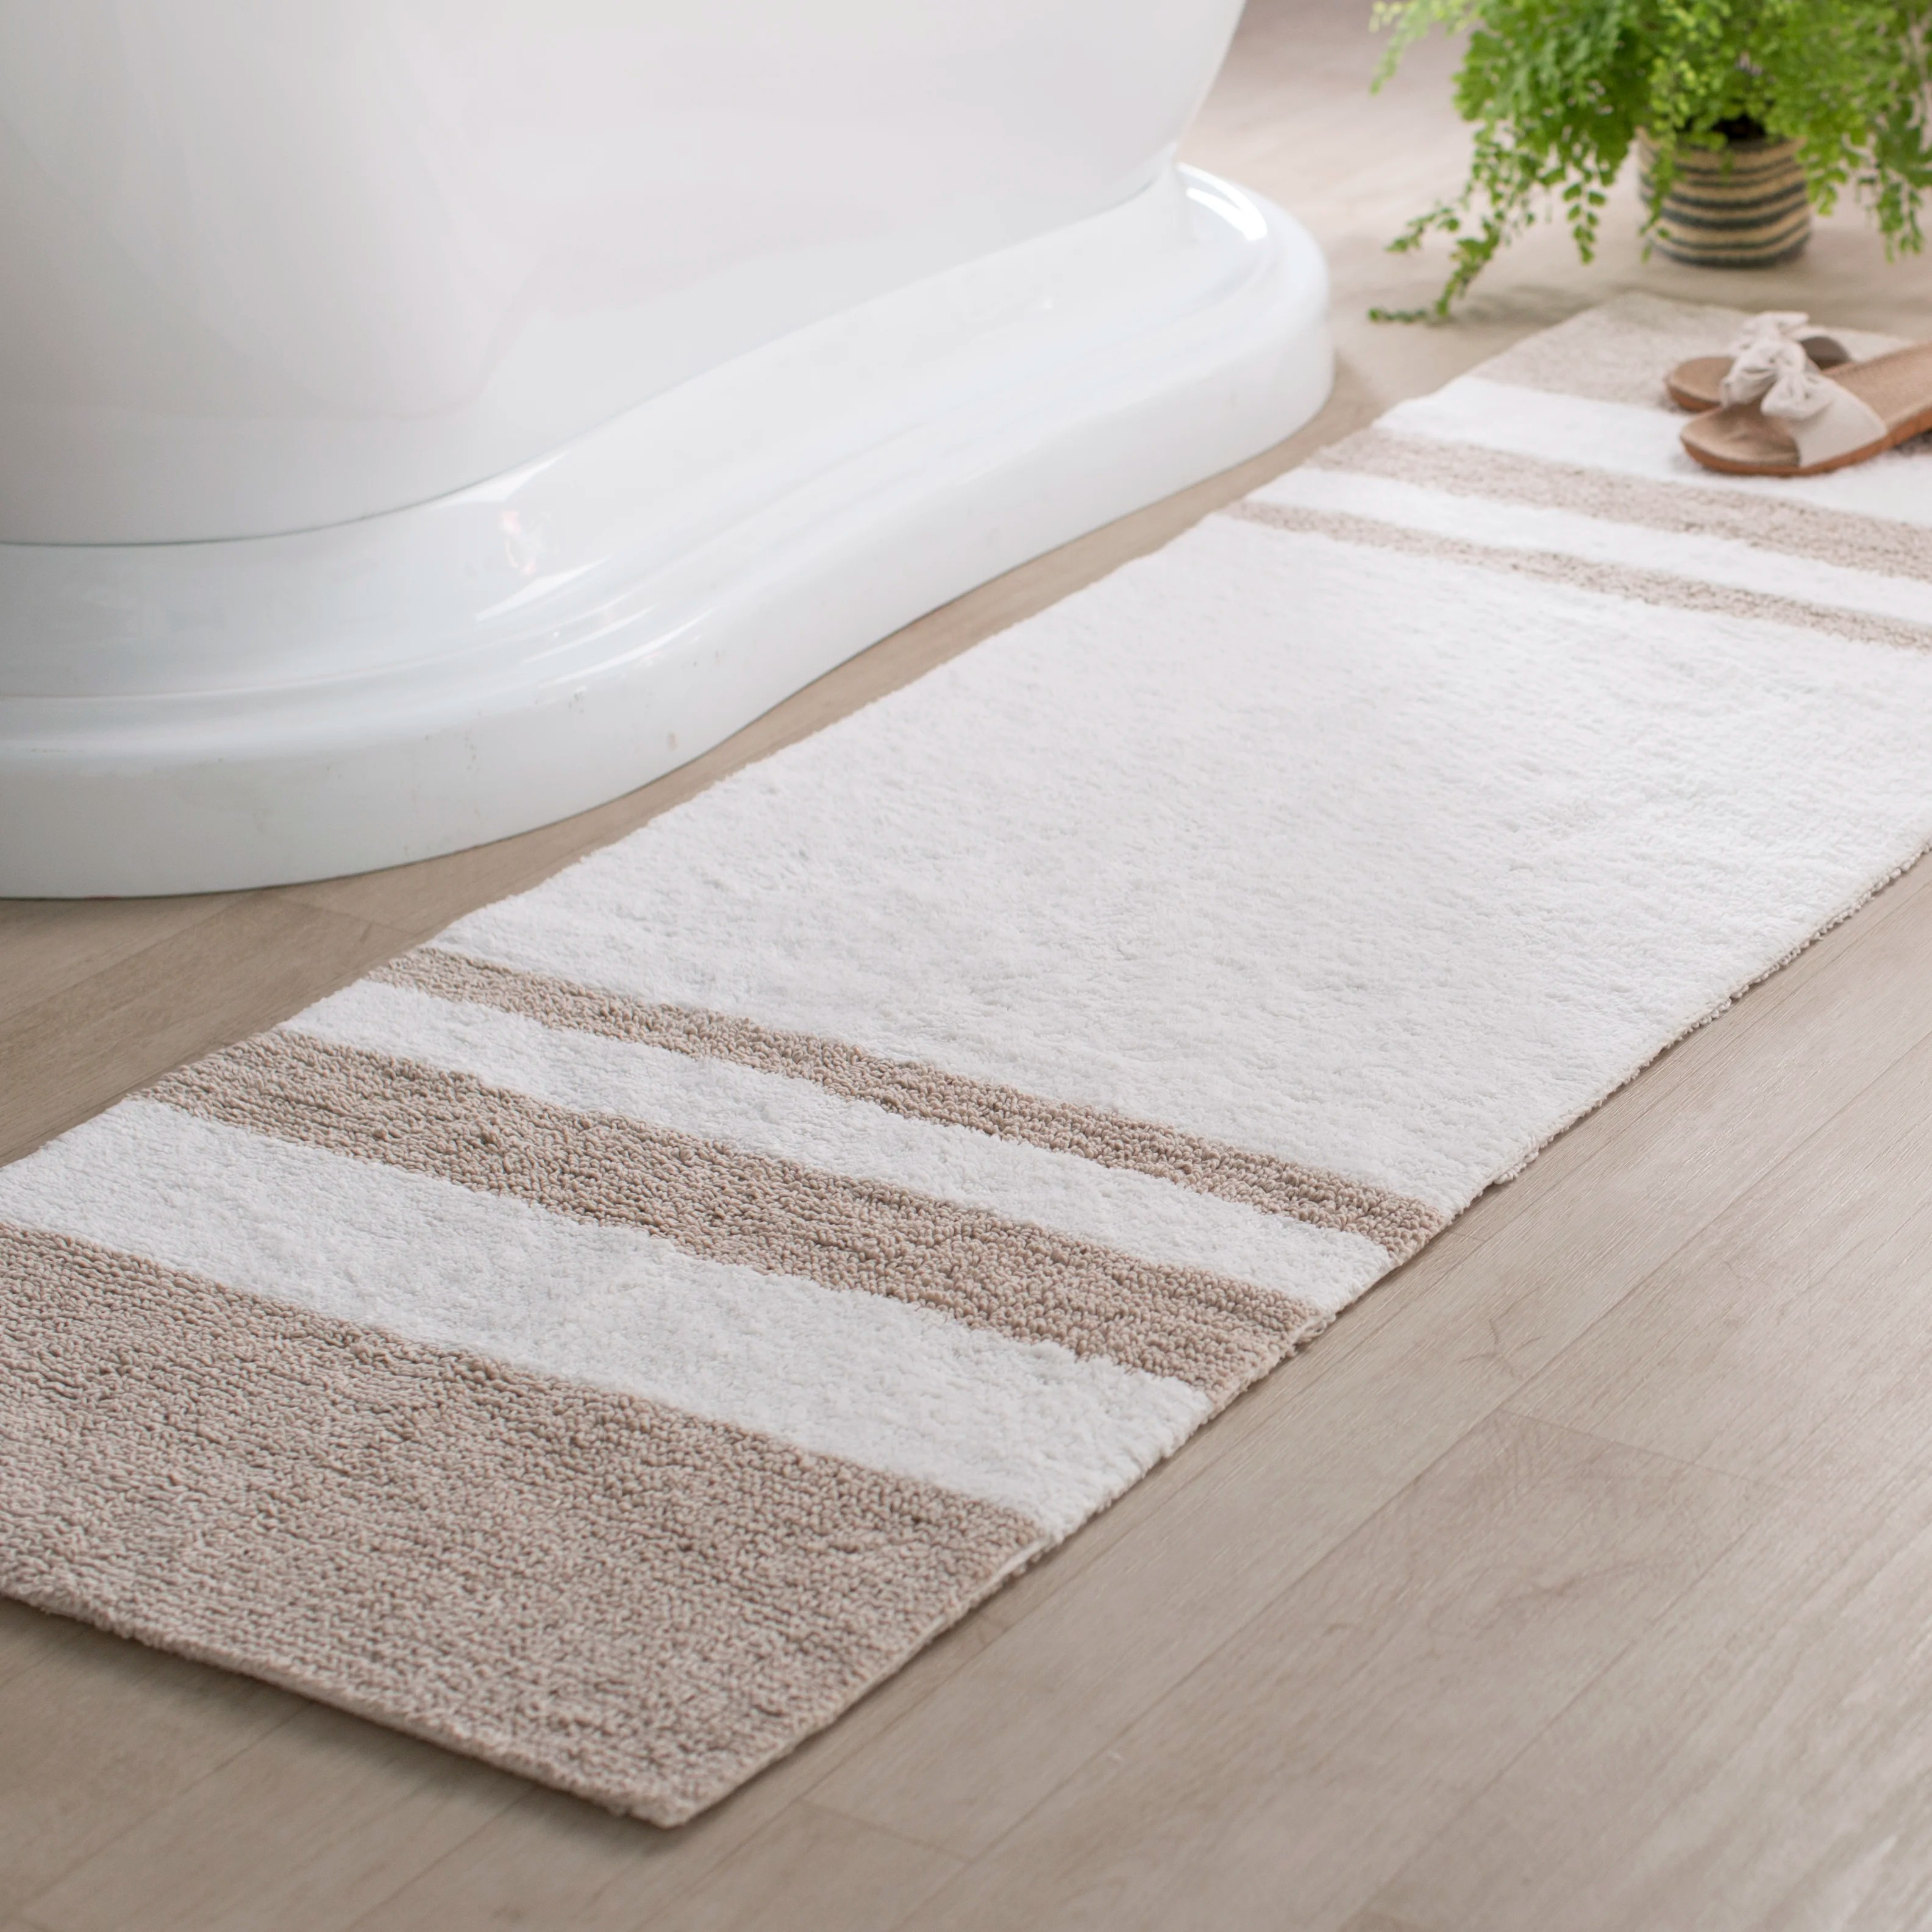 rosenbloom rectangular 100 cotton striped bath rug